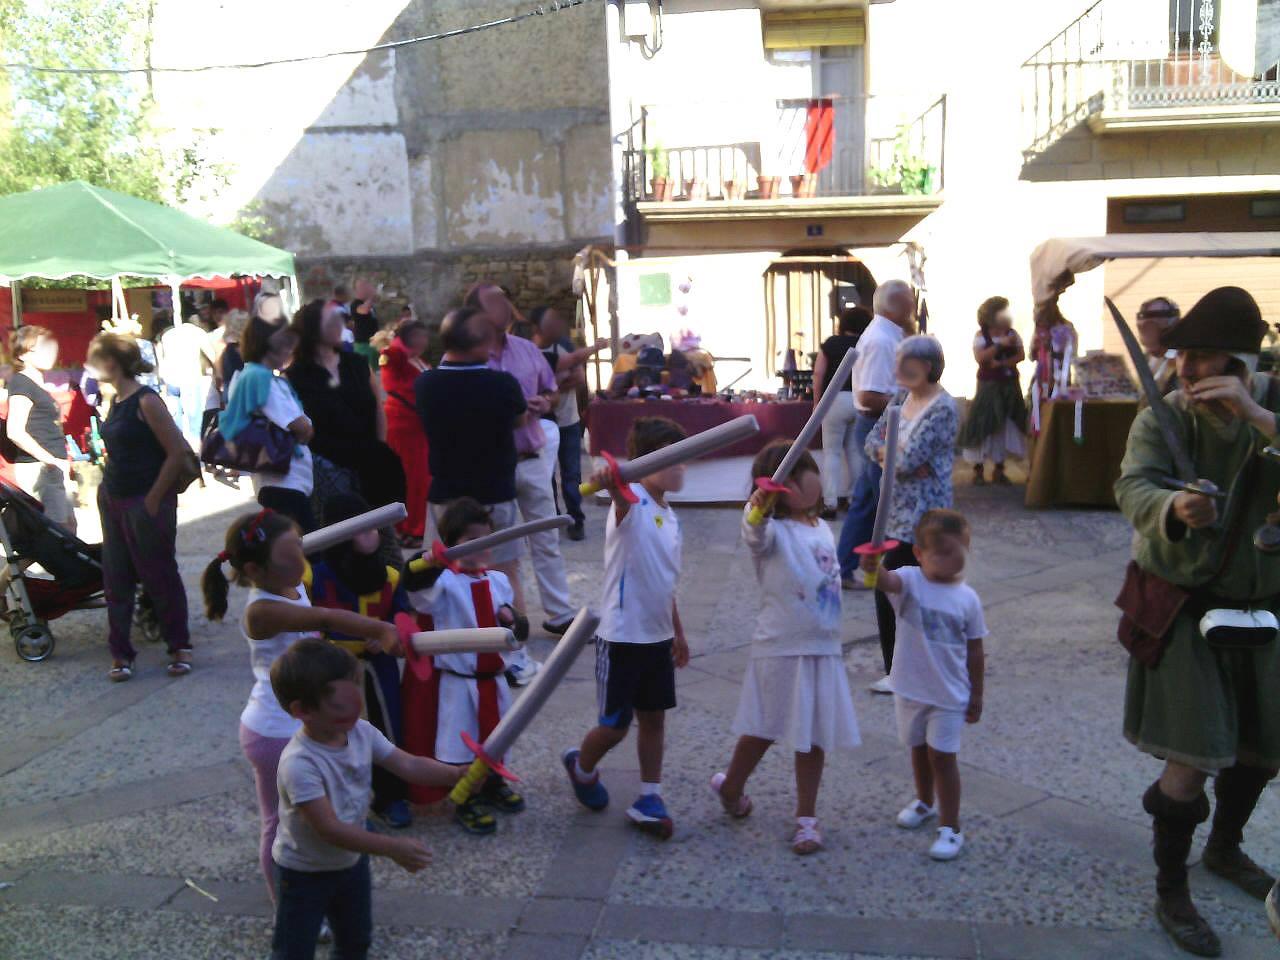 Taller de lucha con espadas  en Luesia en la Don Miguelada